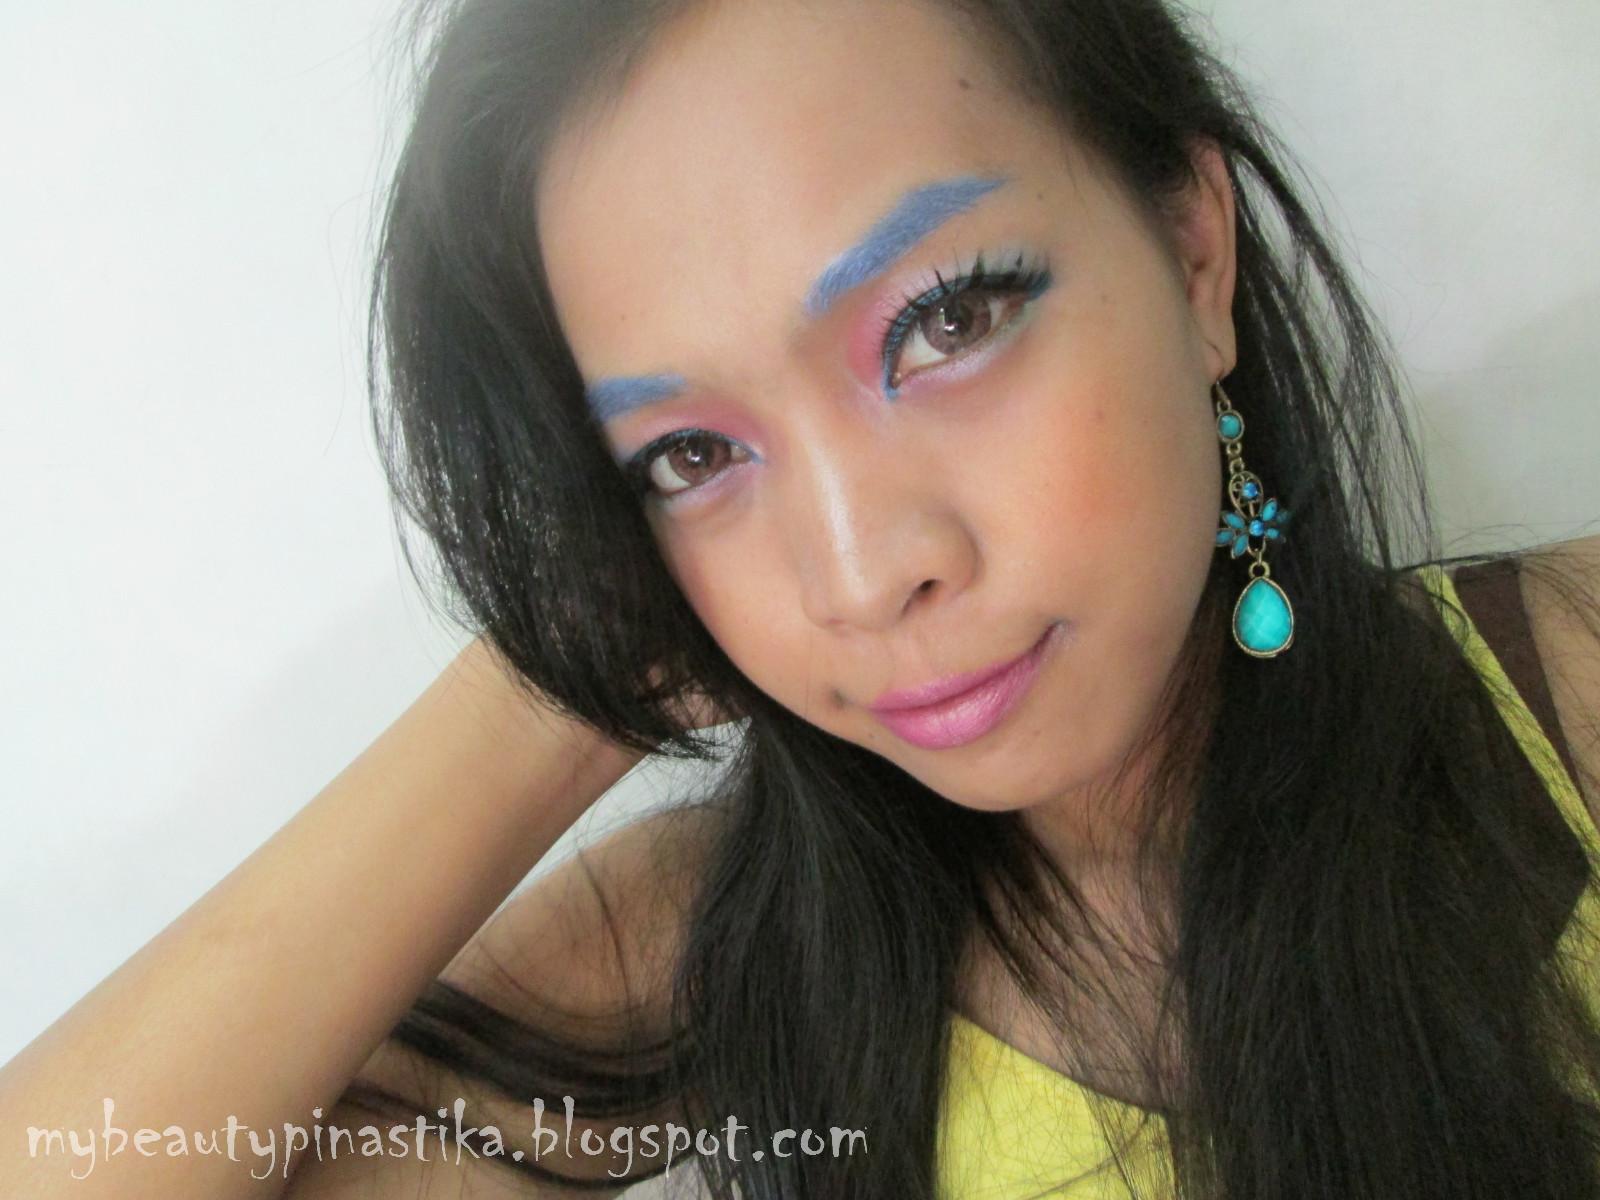 Pinastika Beauty Blog ♔: FOTD : Color Pop Make Up